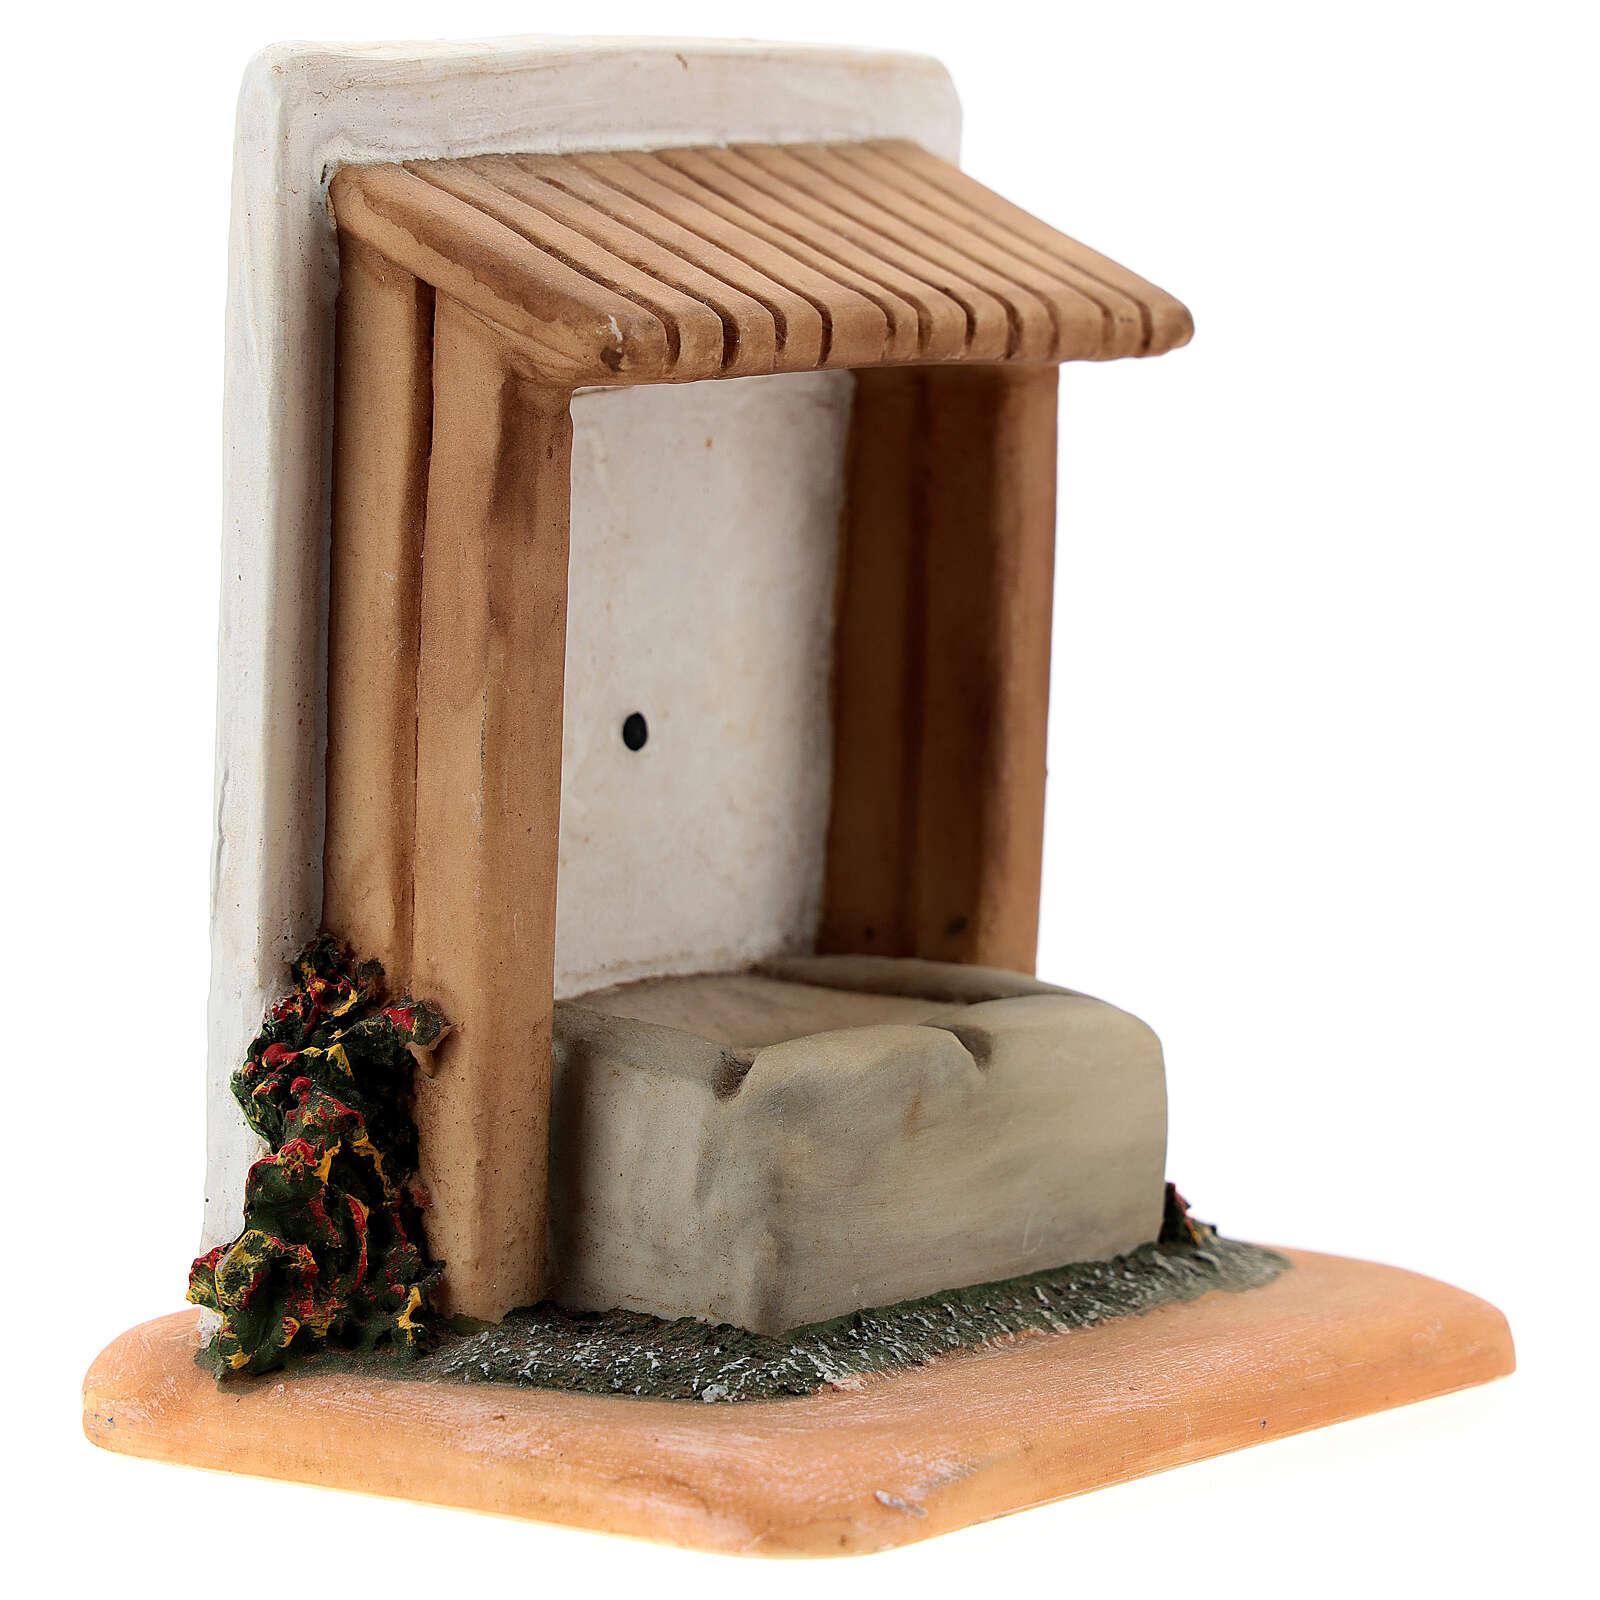 STOCK Abrevadero con techo resina belén 7 cm Fontanini 4